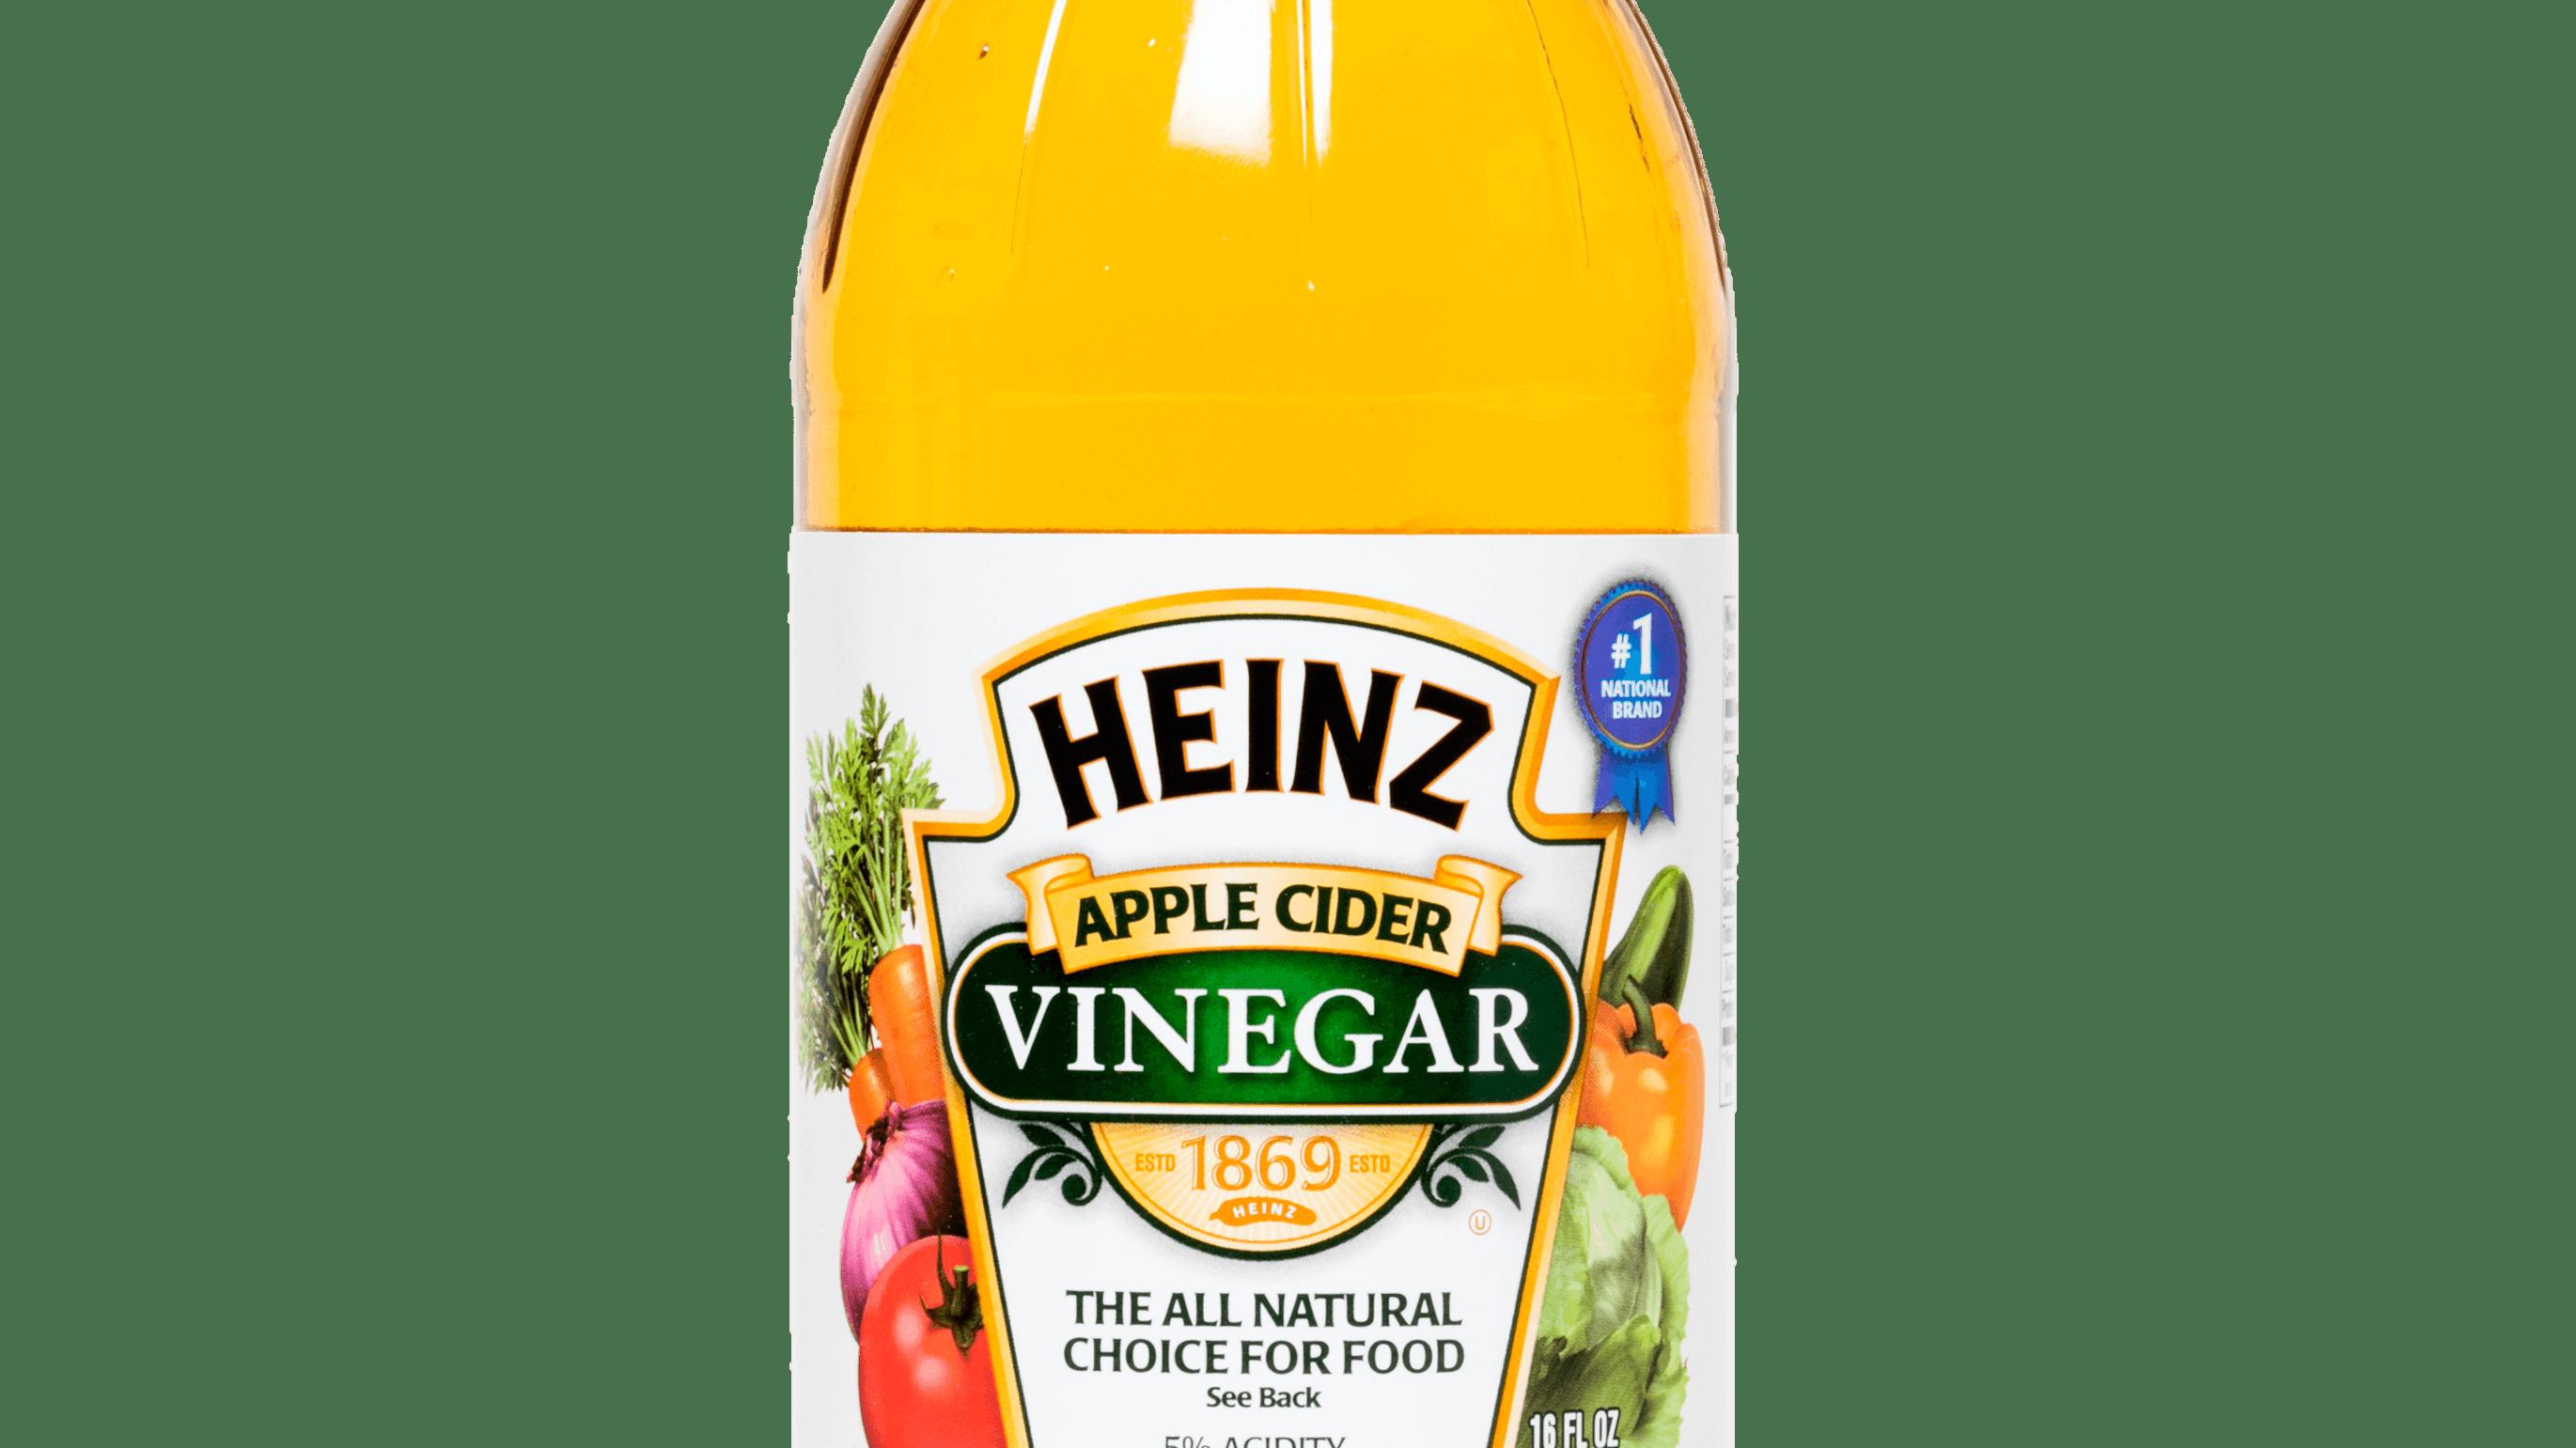 31894 sil apple cider vinegar heinz filtered apple cider vinegar